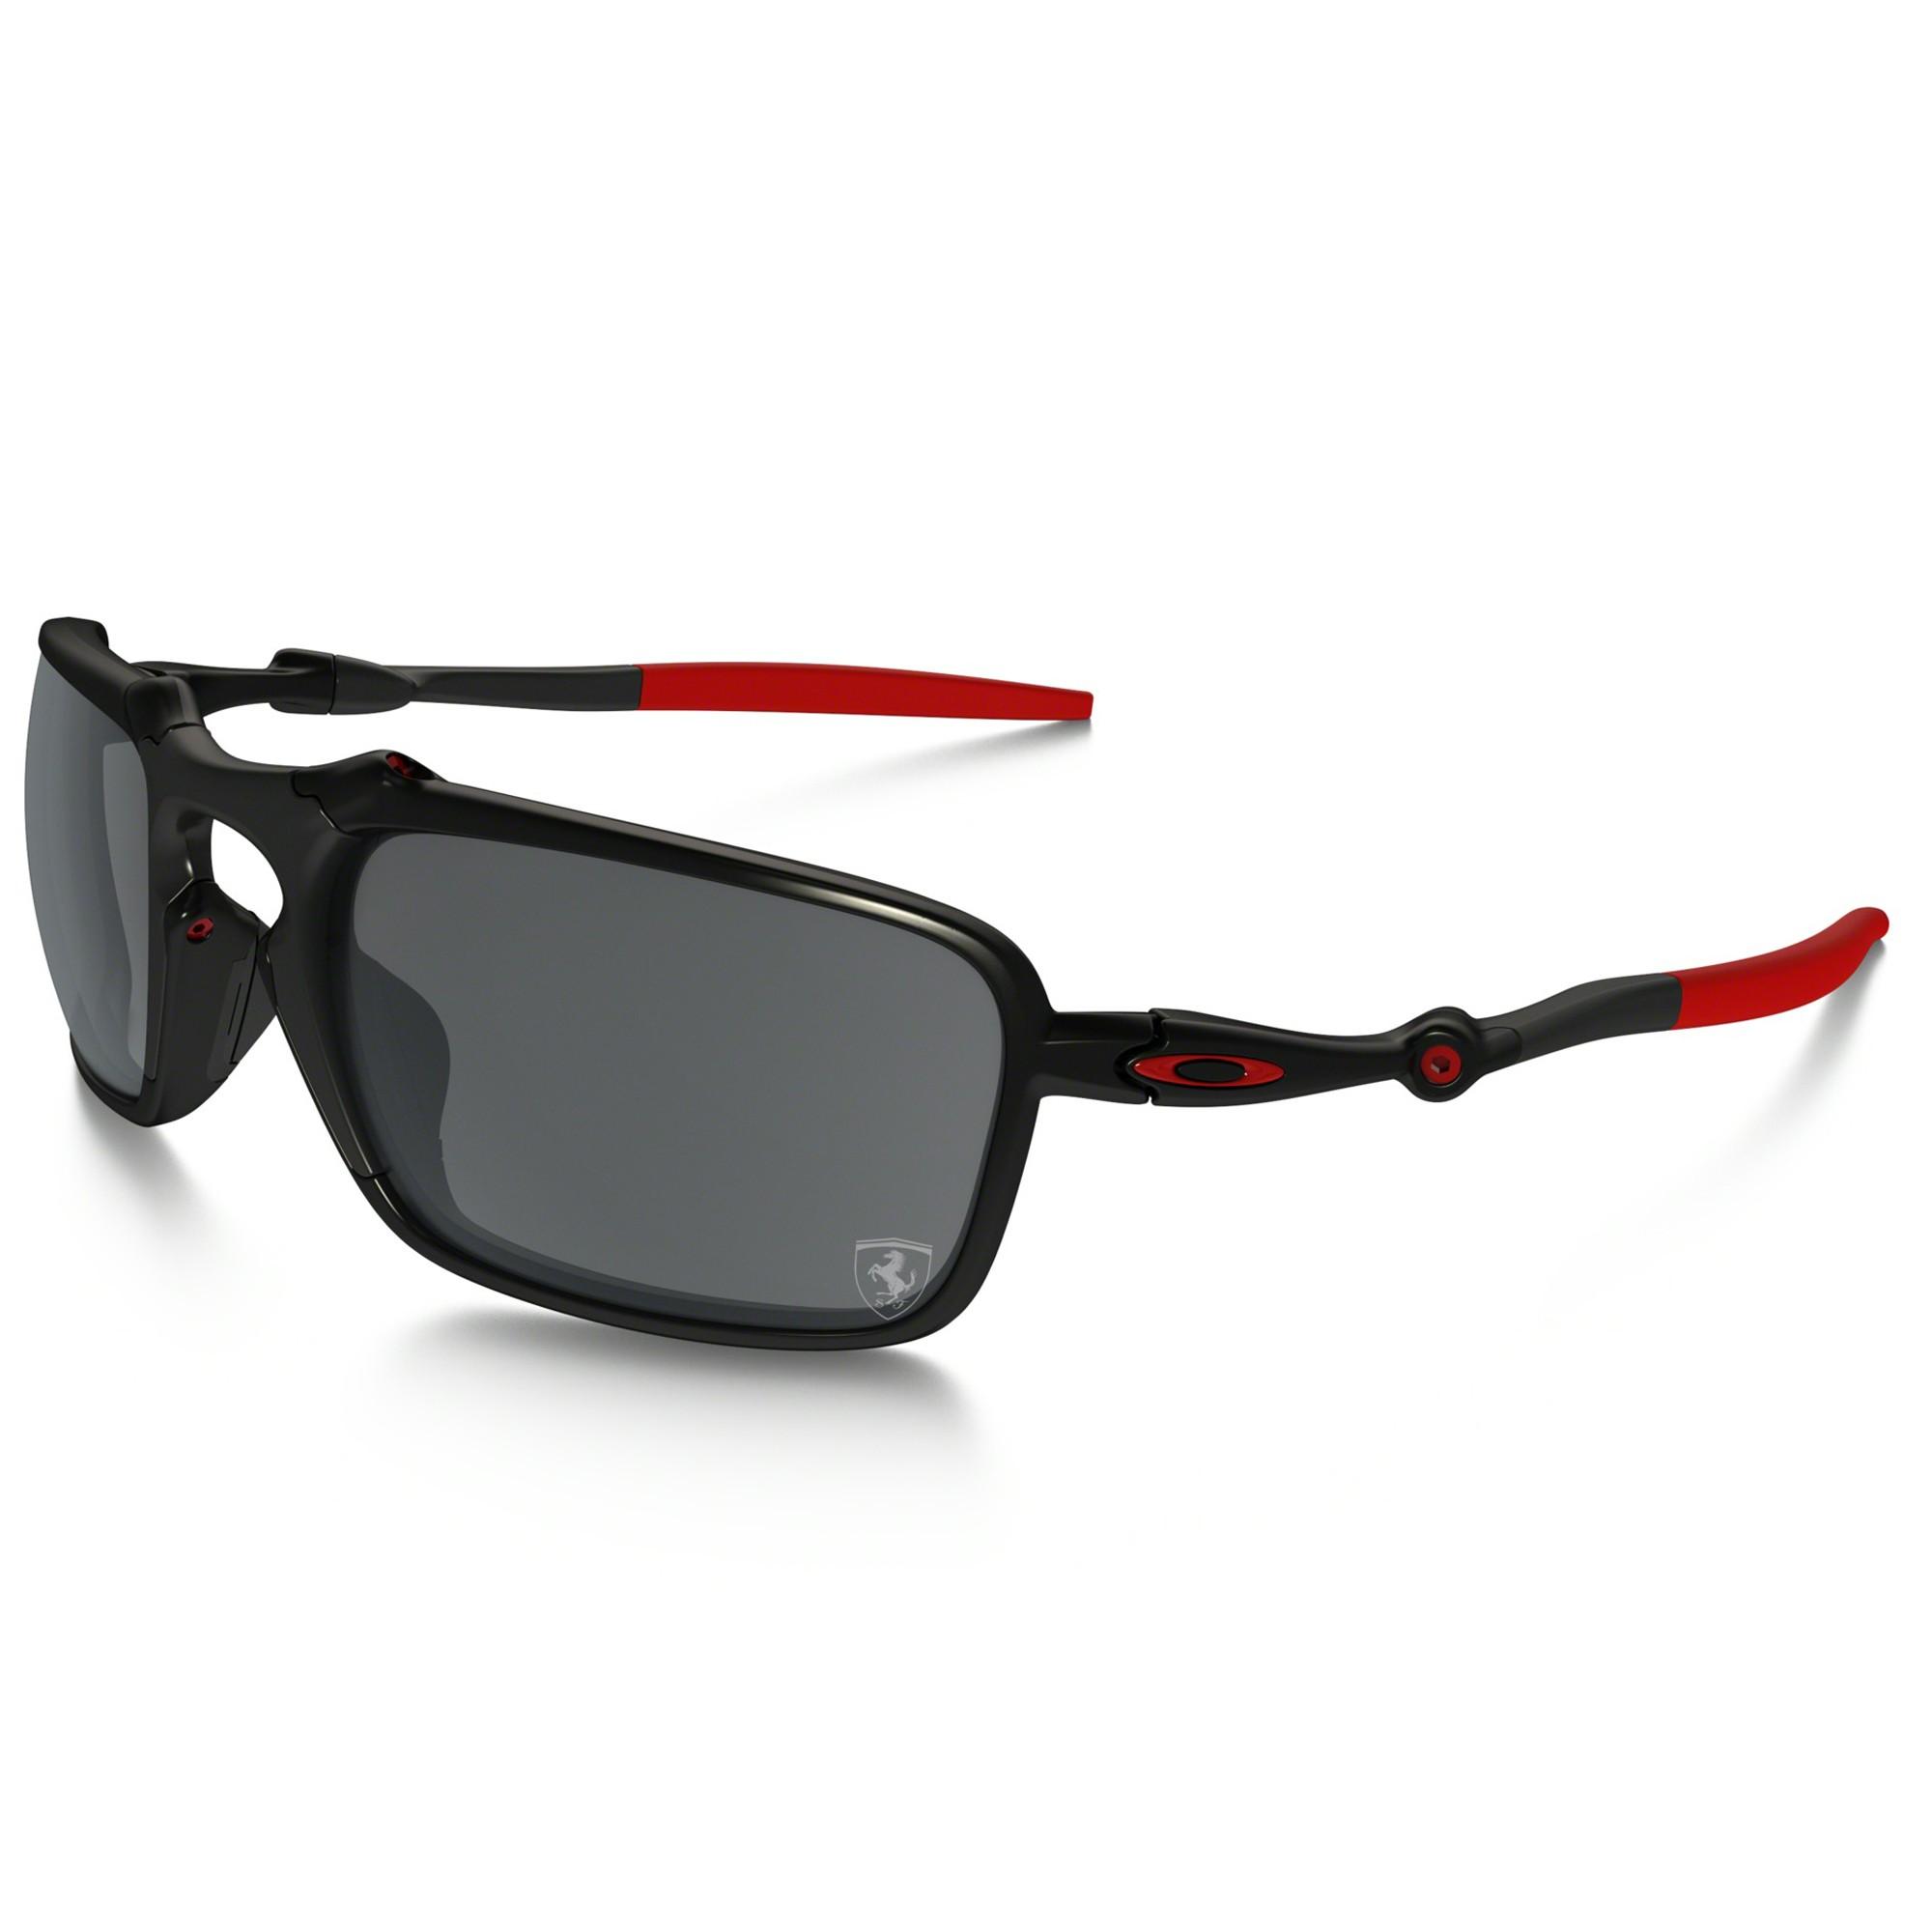 over mouse tom janina sunglasses ferrari to image ford zoom men for ft